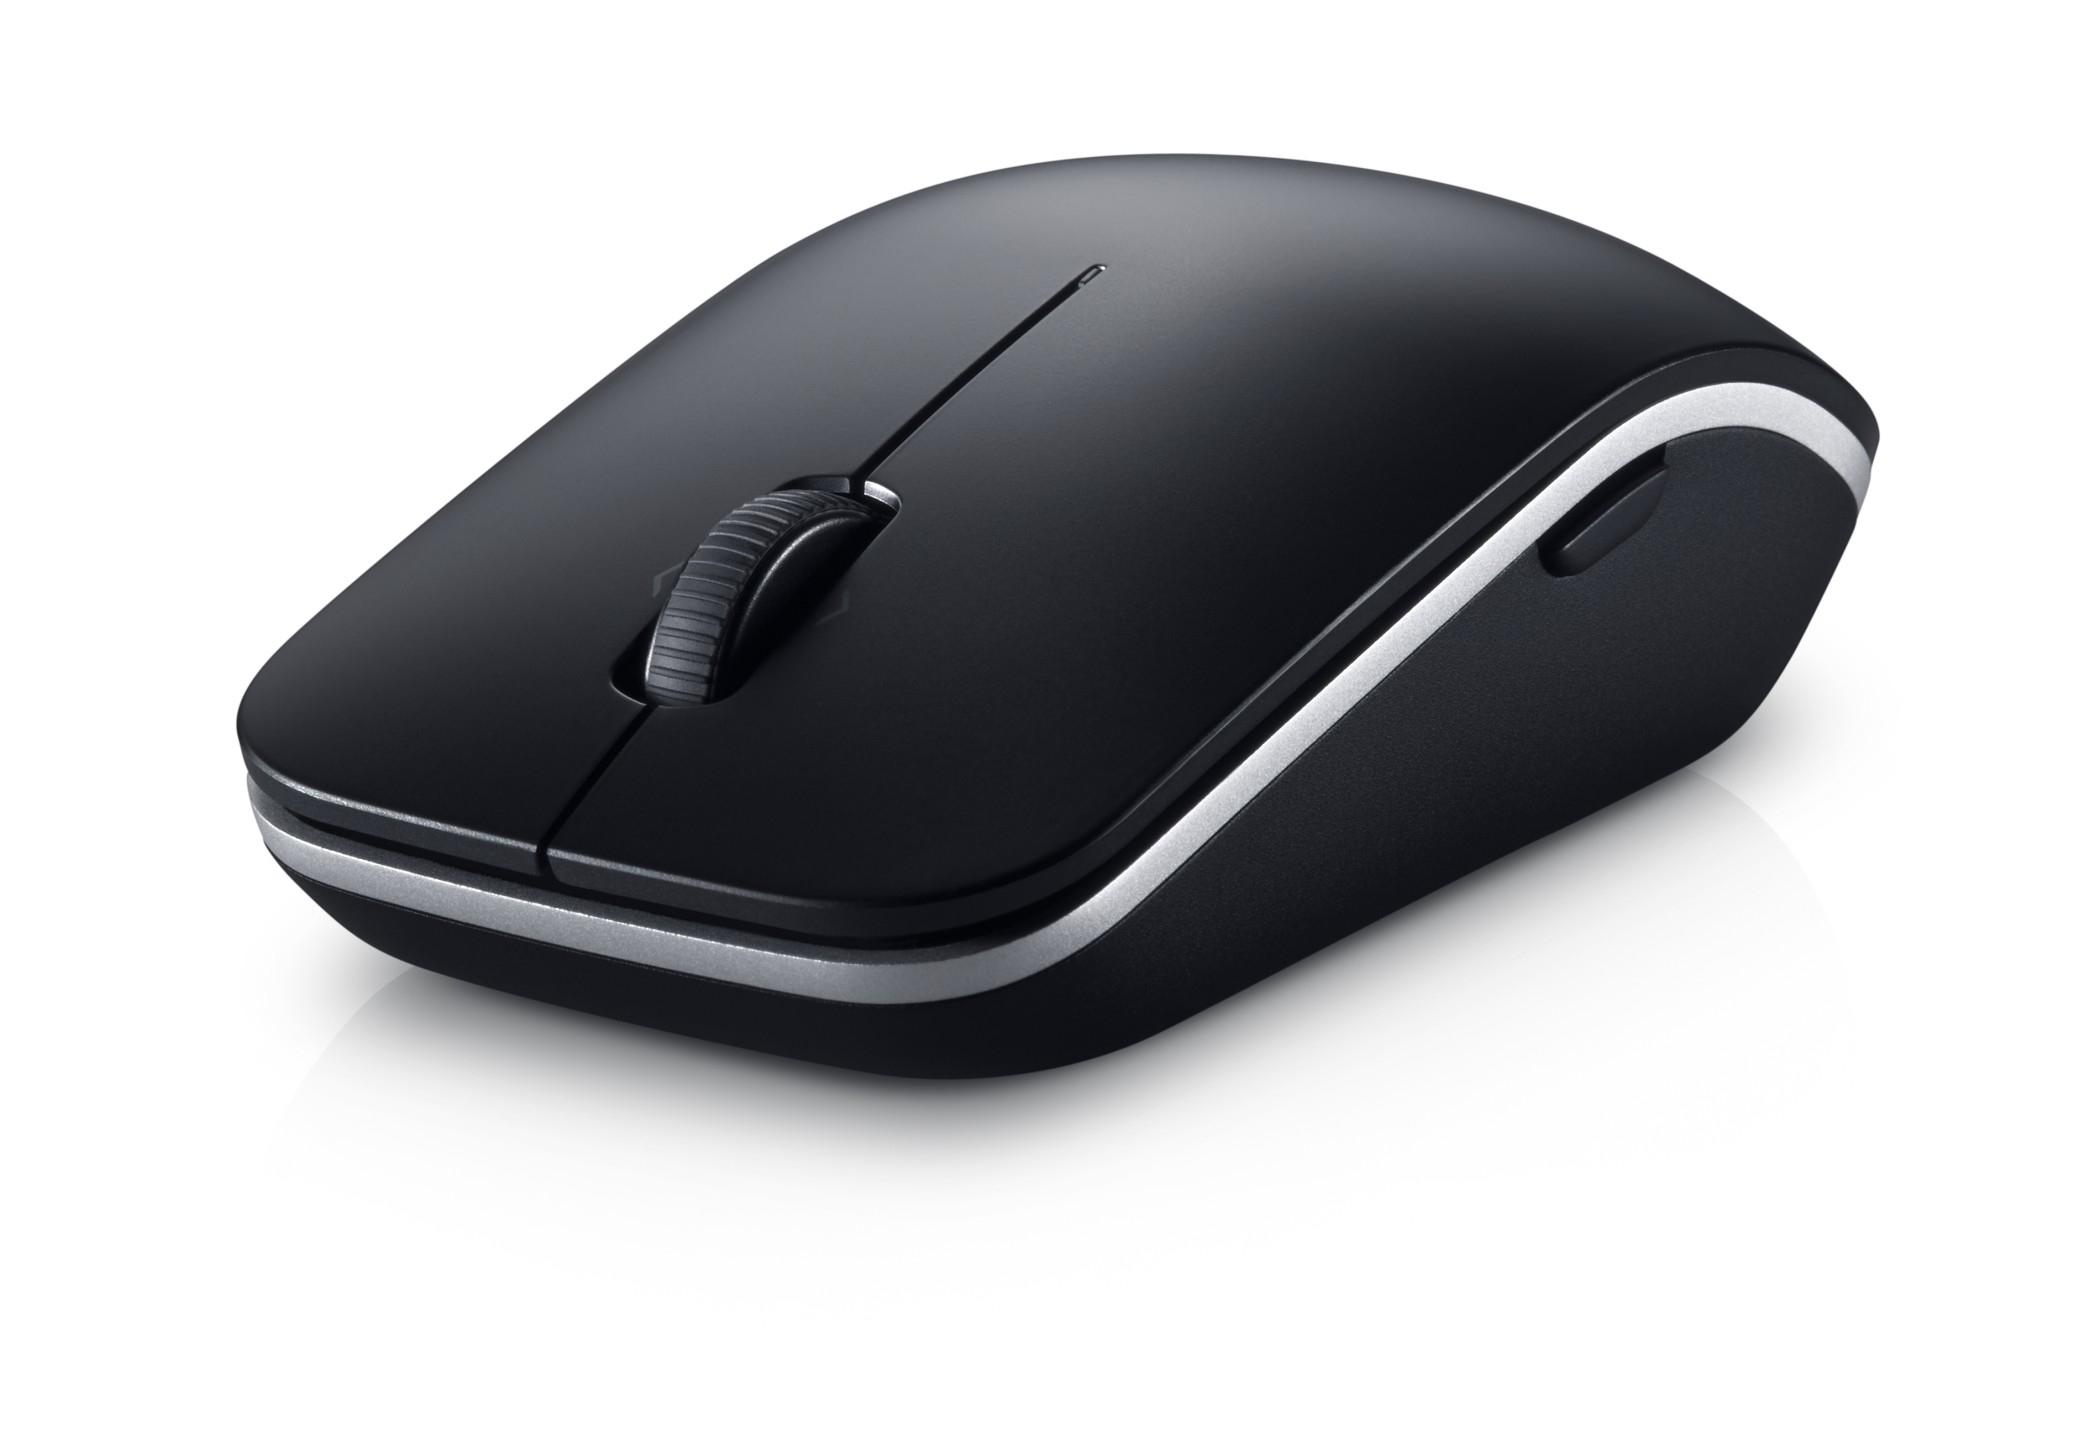 Dell Wireless Mouse - WM324